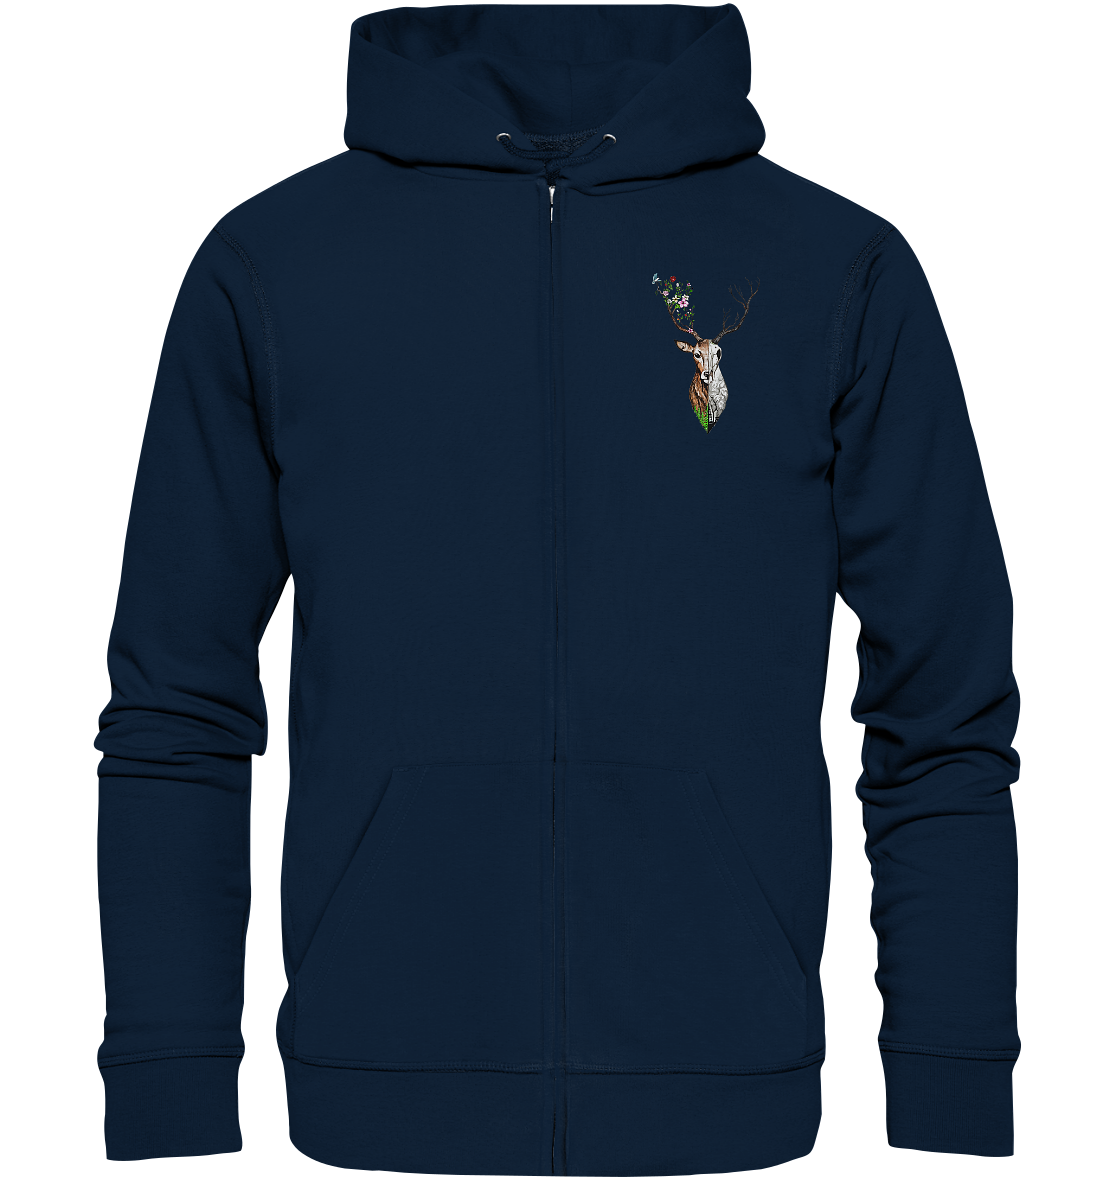 front-organic-zipper-0e2035-1116x-1.png